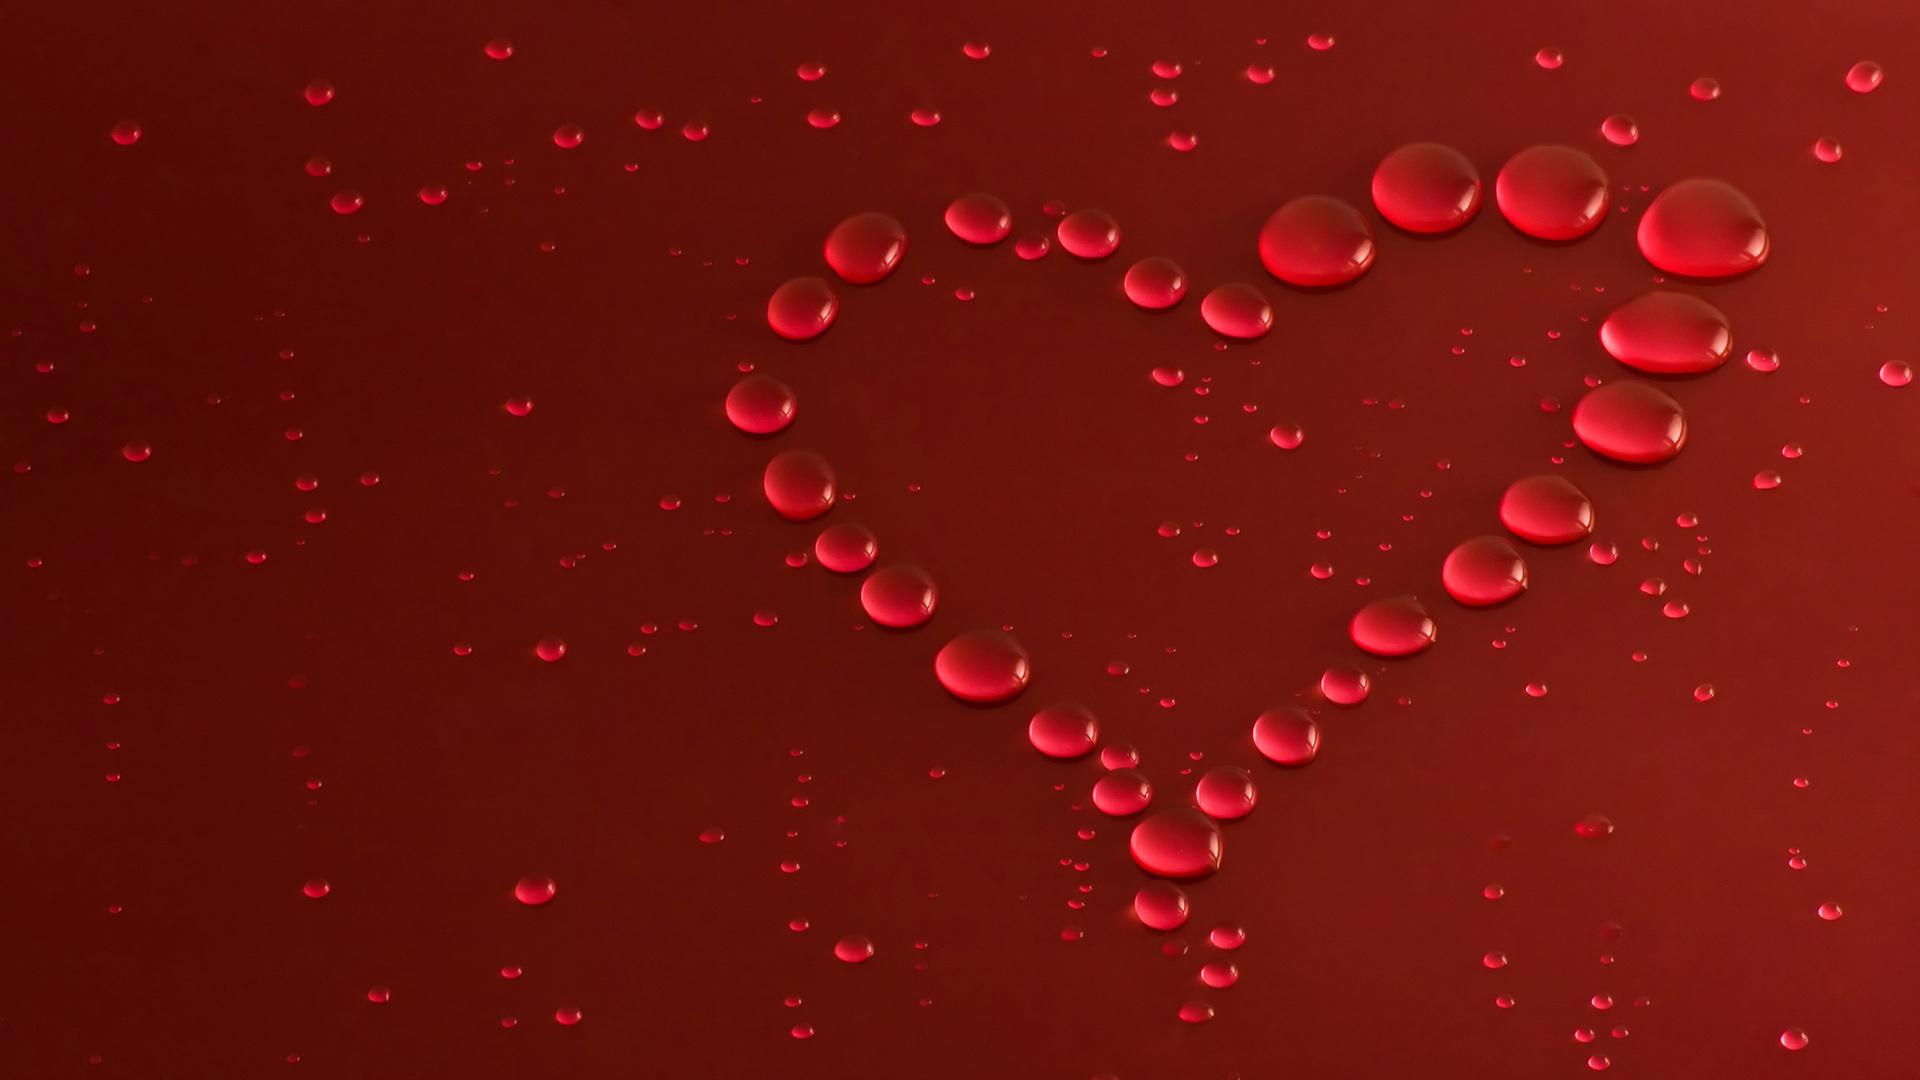 <p>Сердце из капель</p>